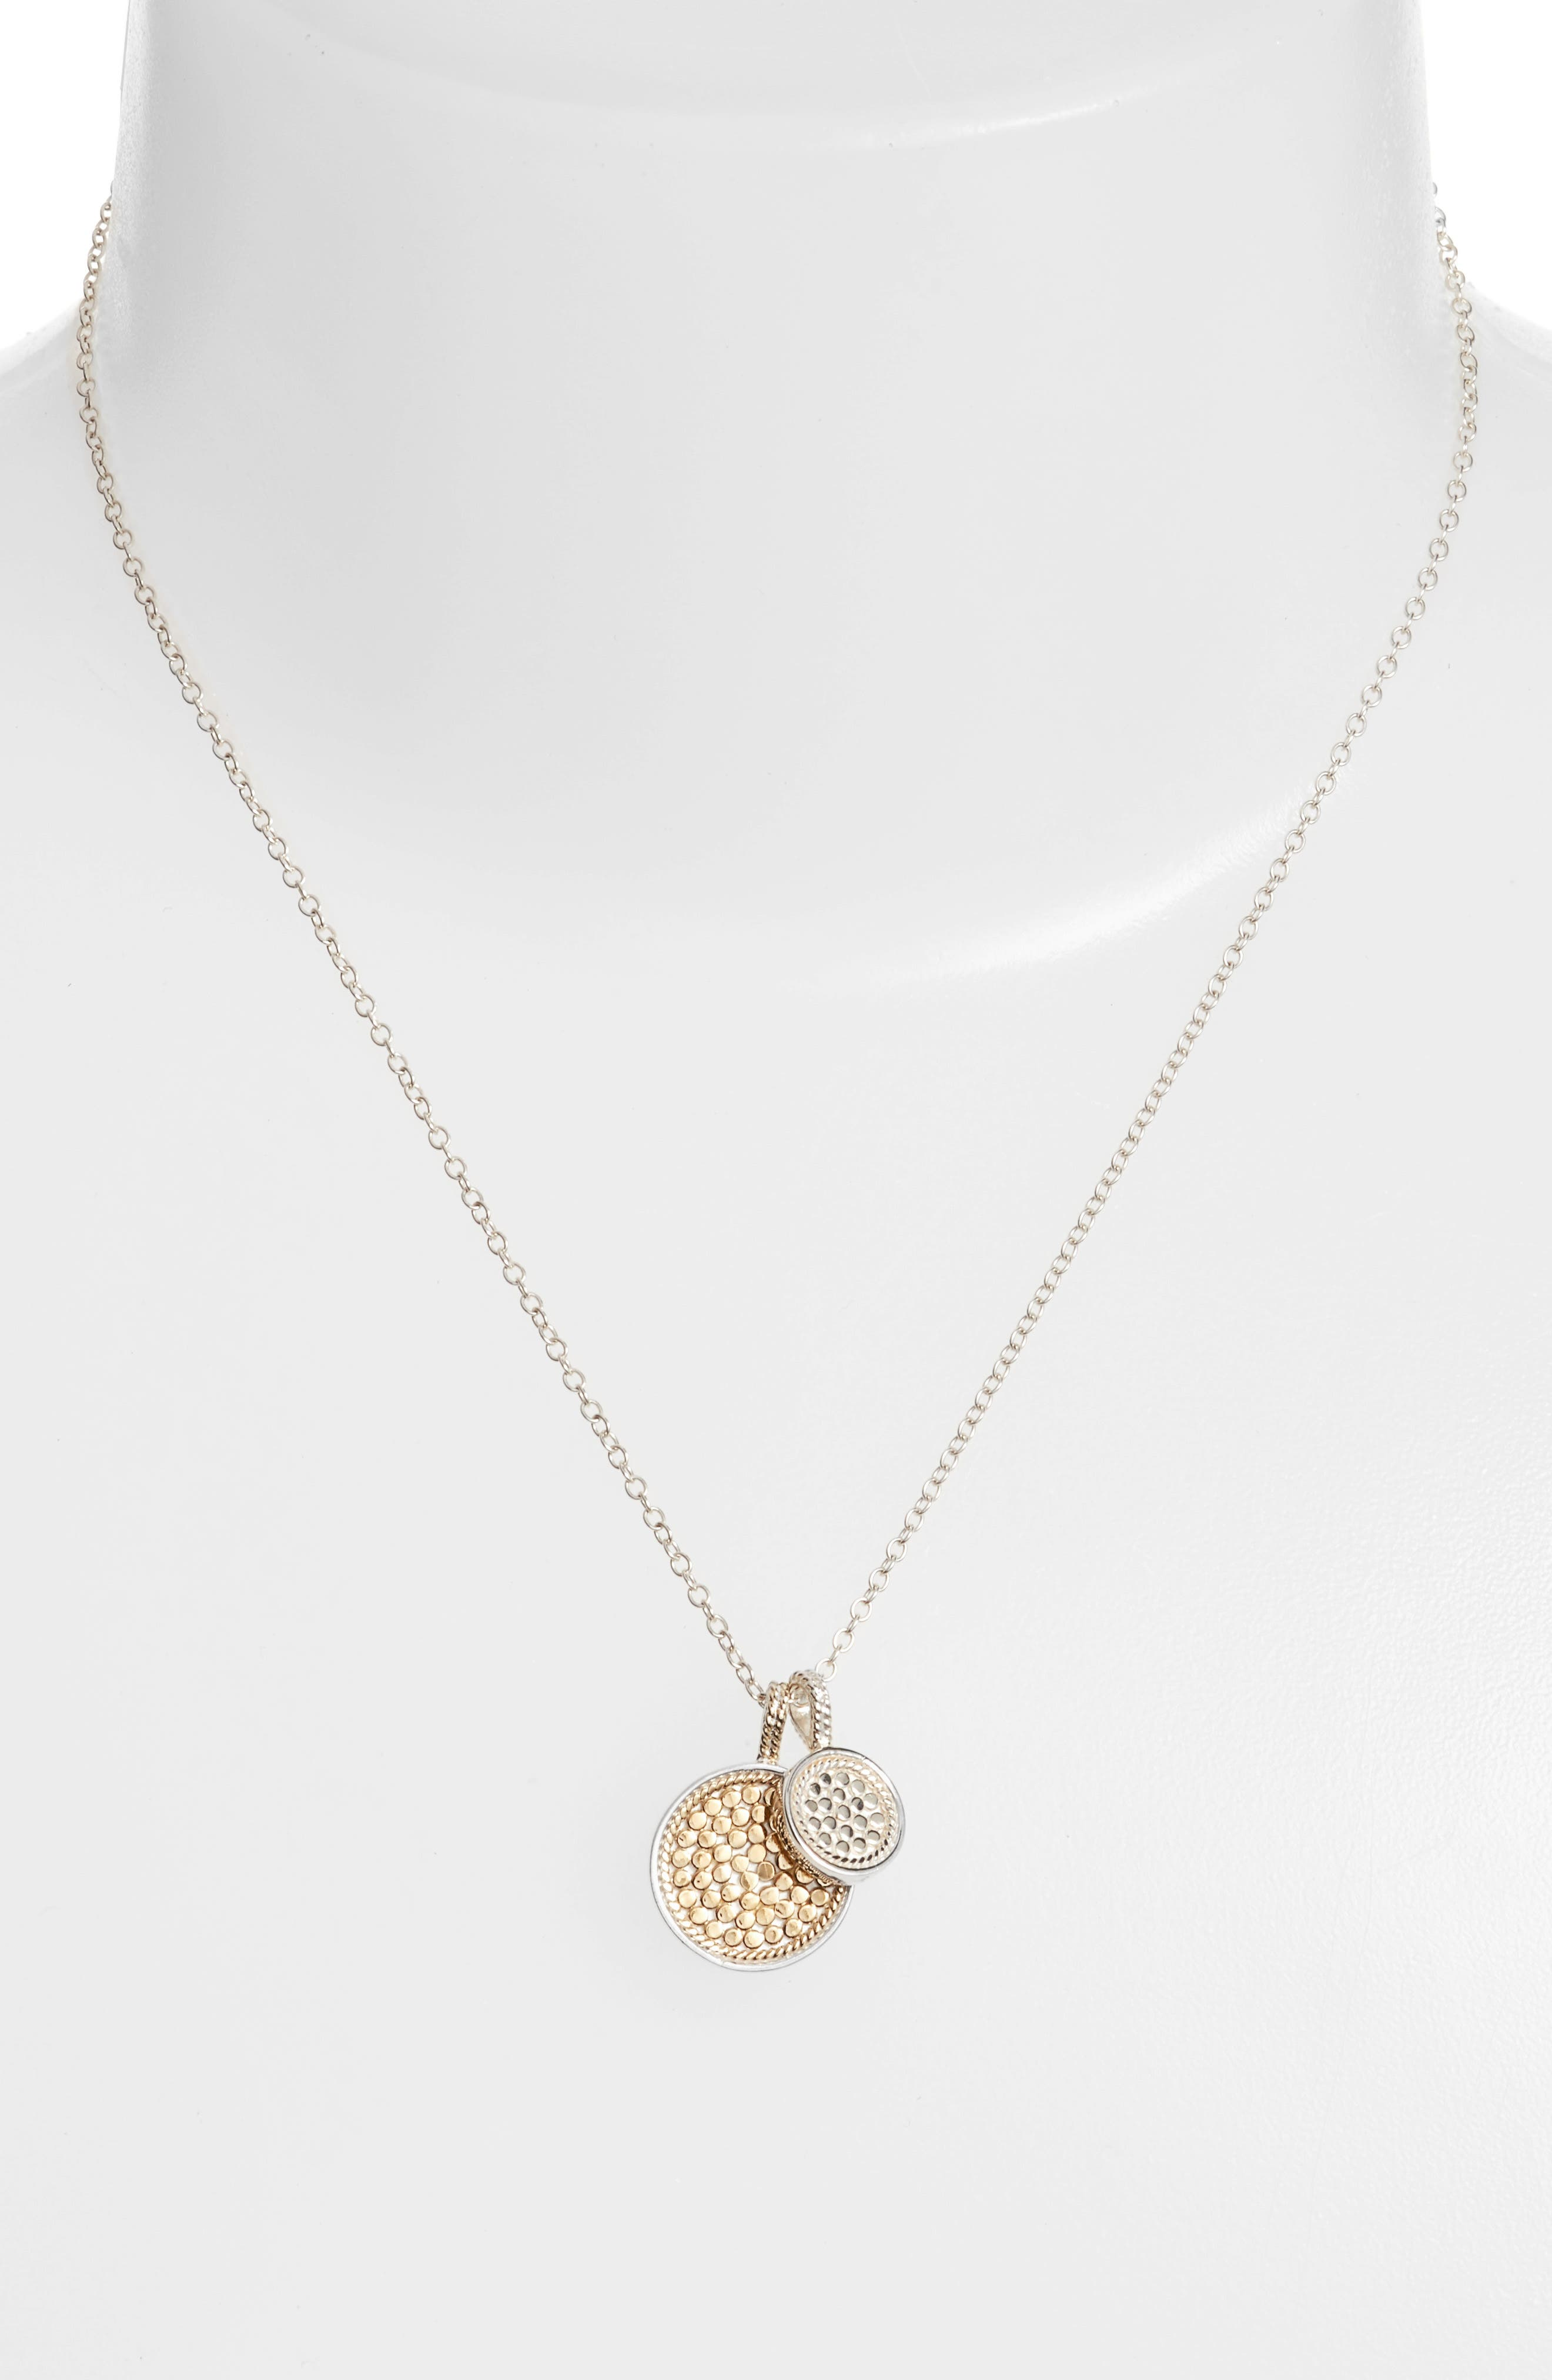 Main Image - Anna Beck Reversible Disc Pendant Necklace